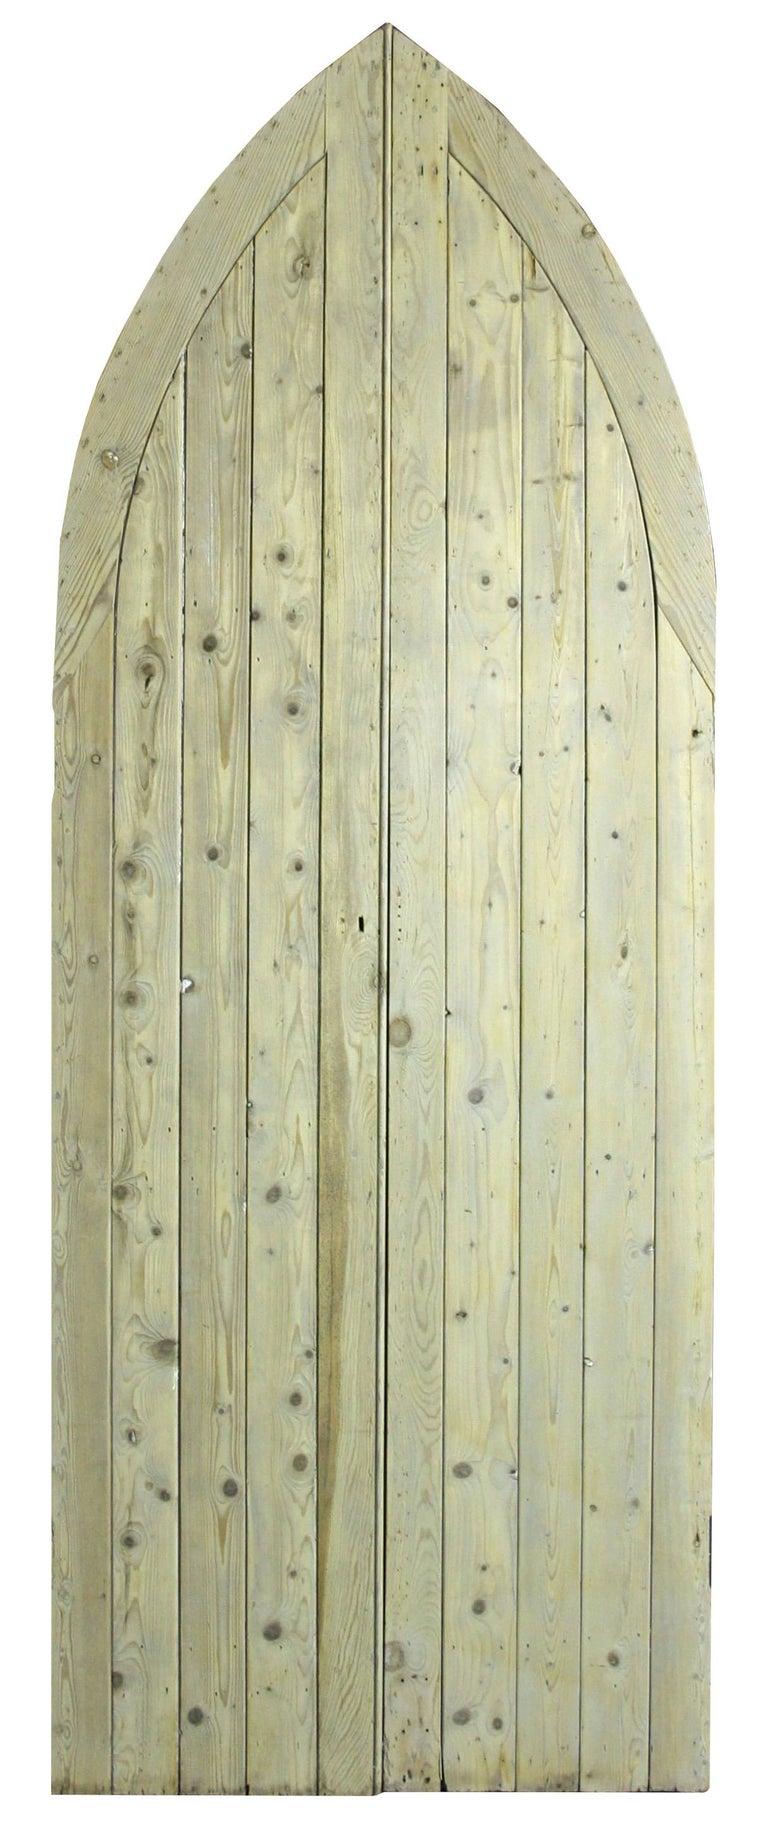 Gothic Antique Exterior Arched Pine Door For Sale